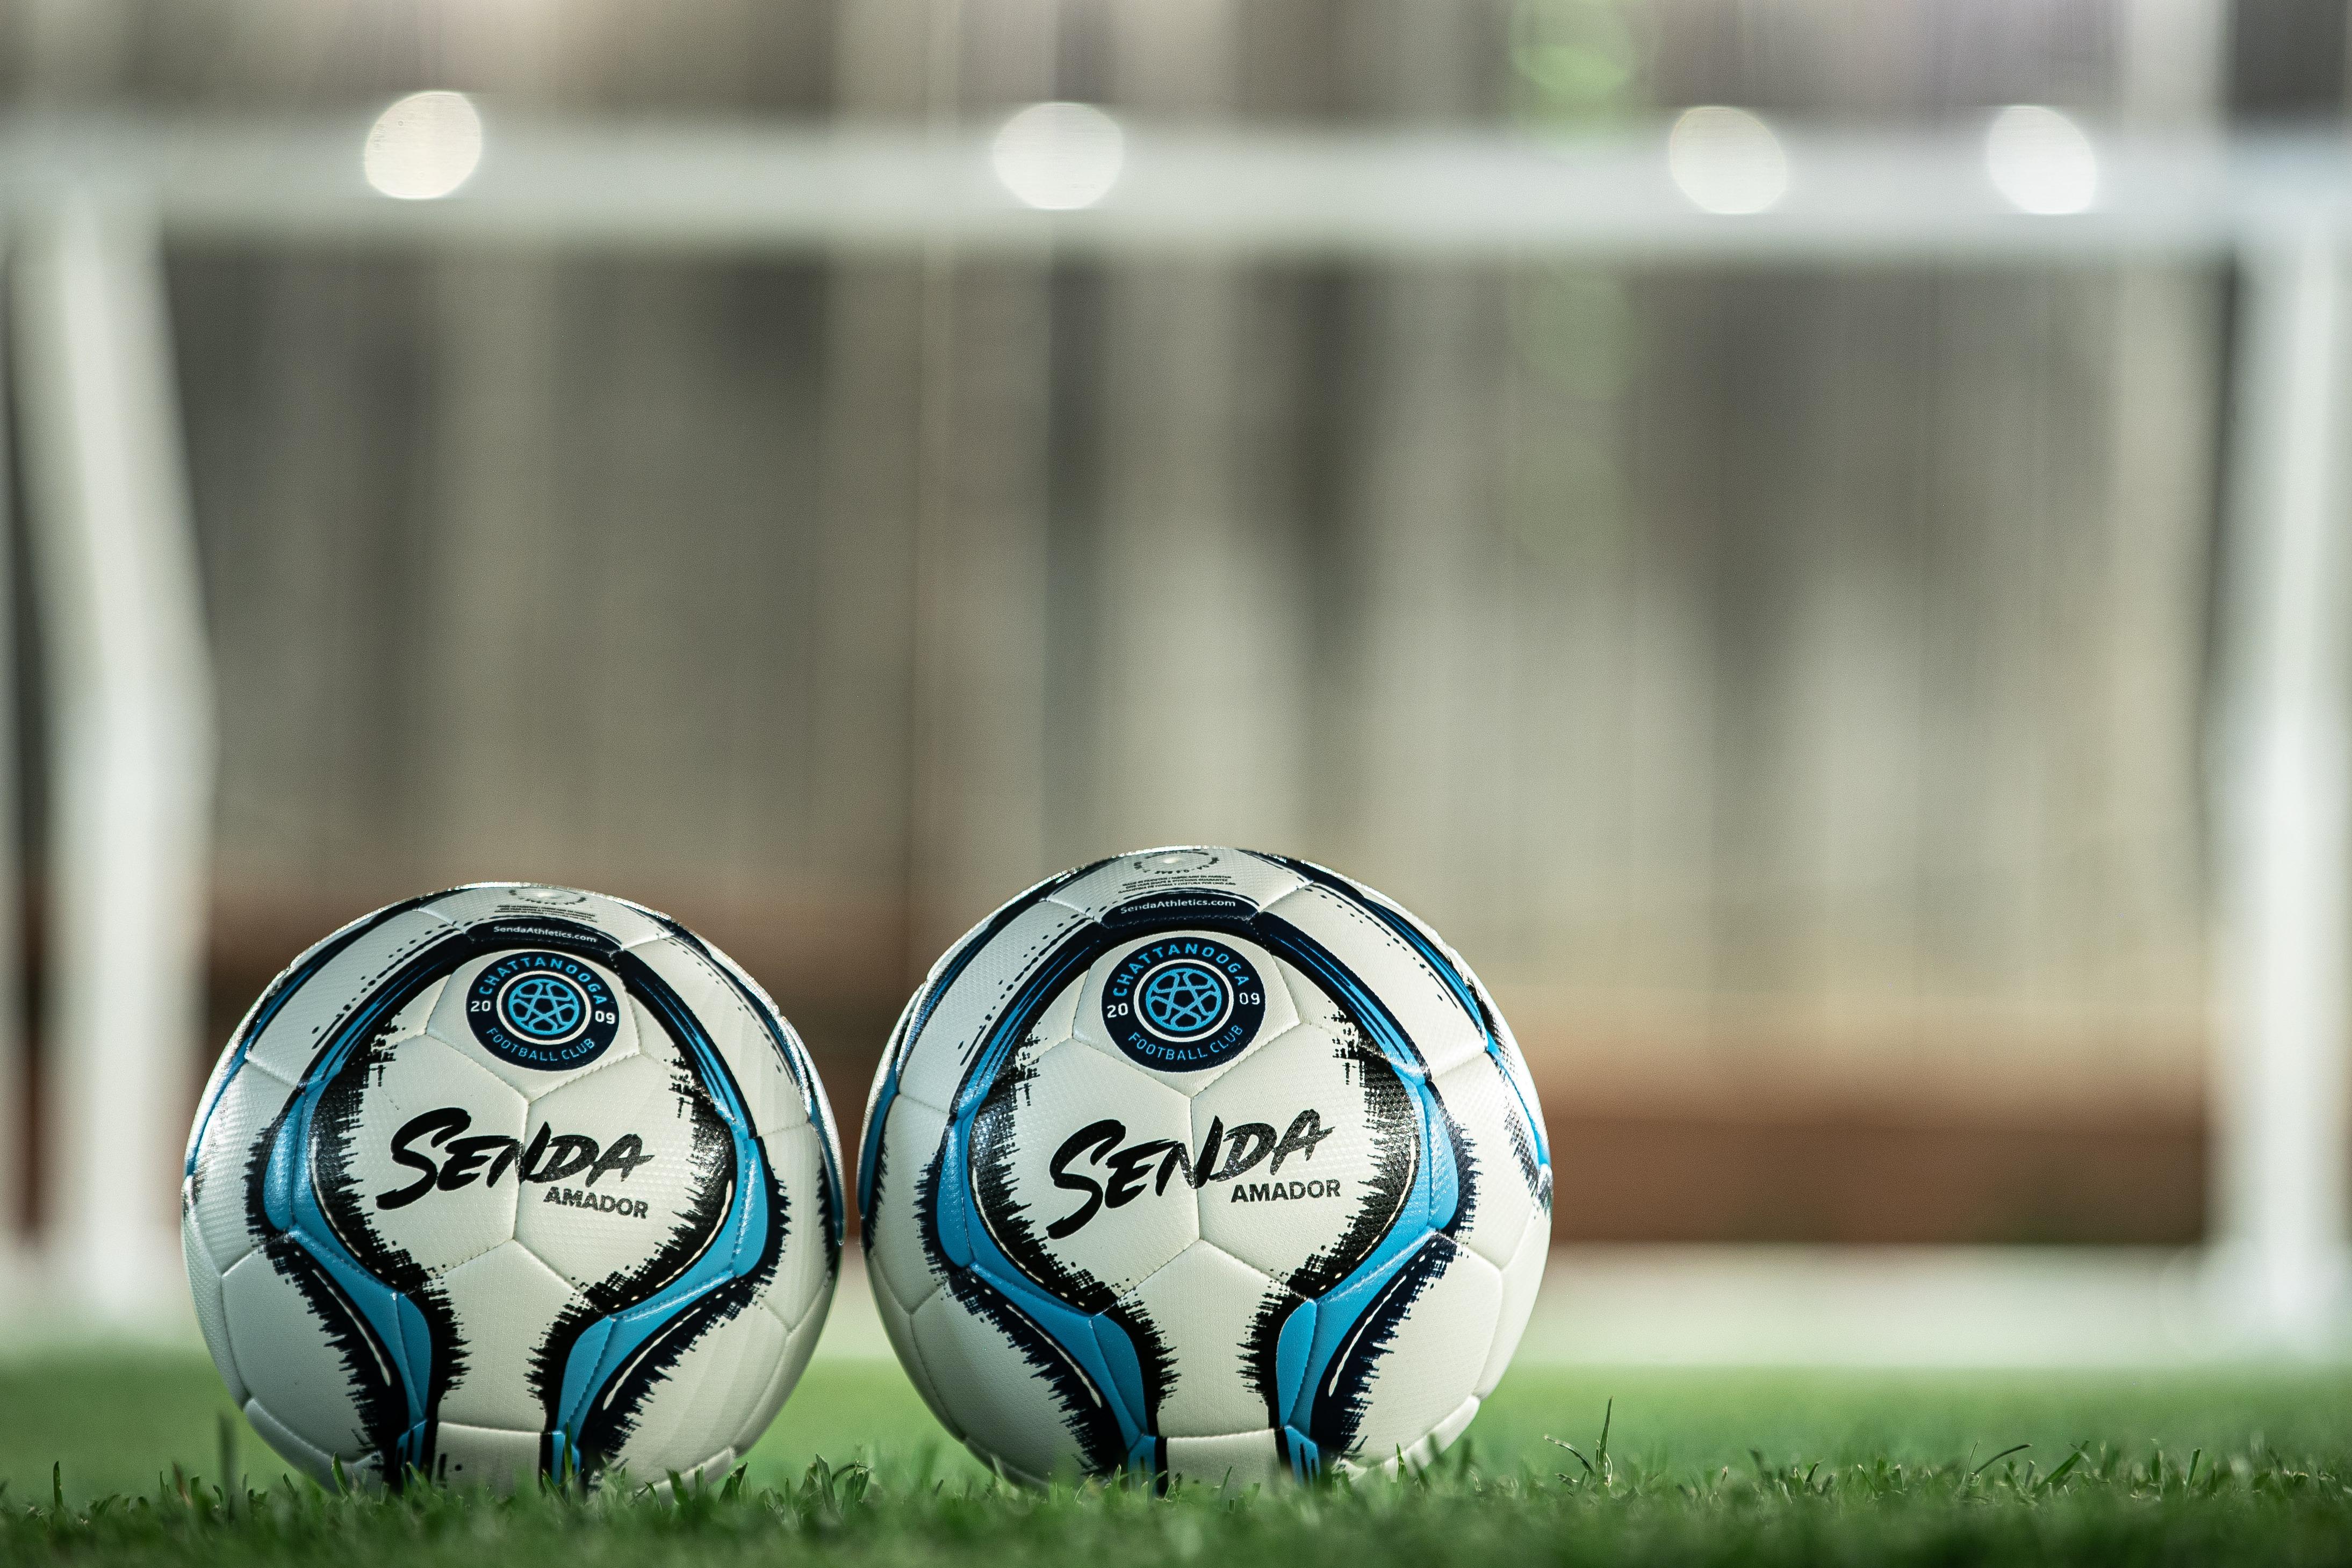 Chattanooga x Senda Amador Ball